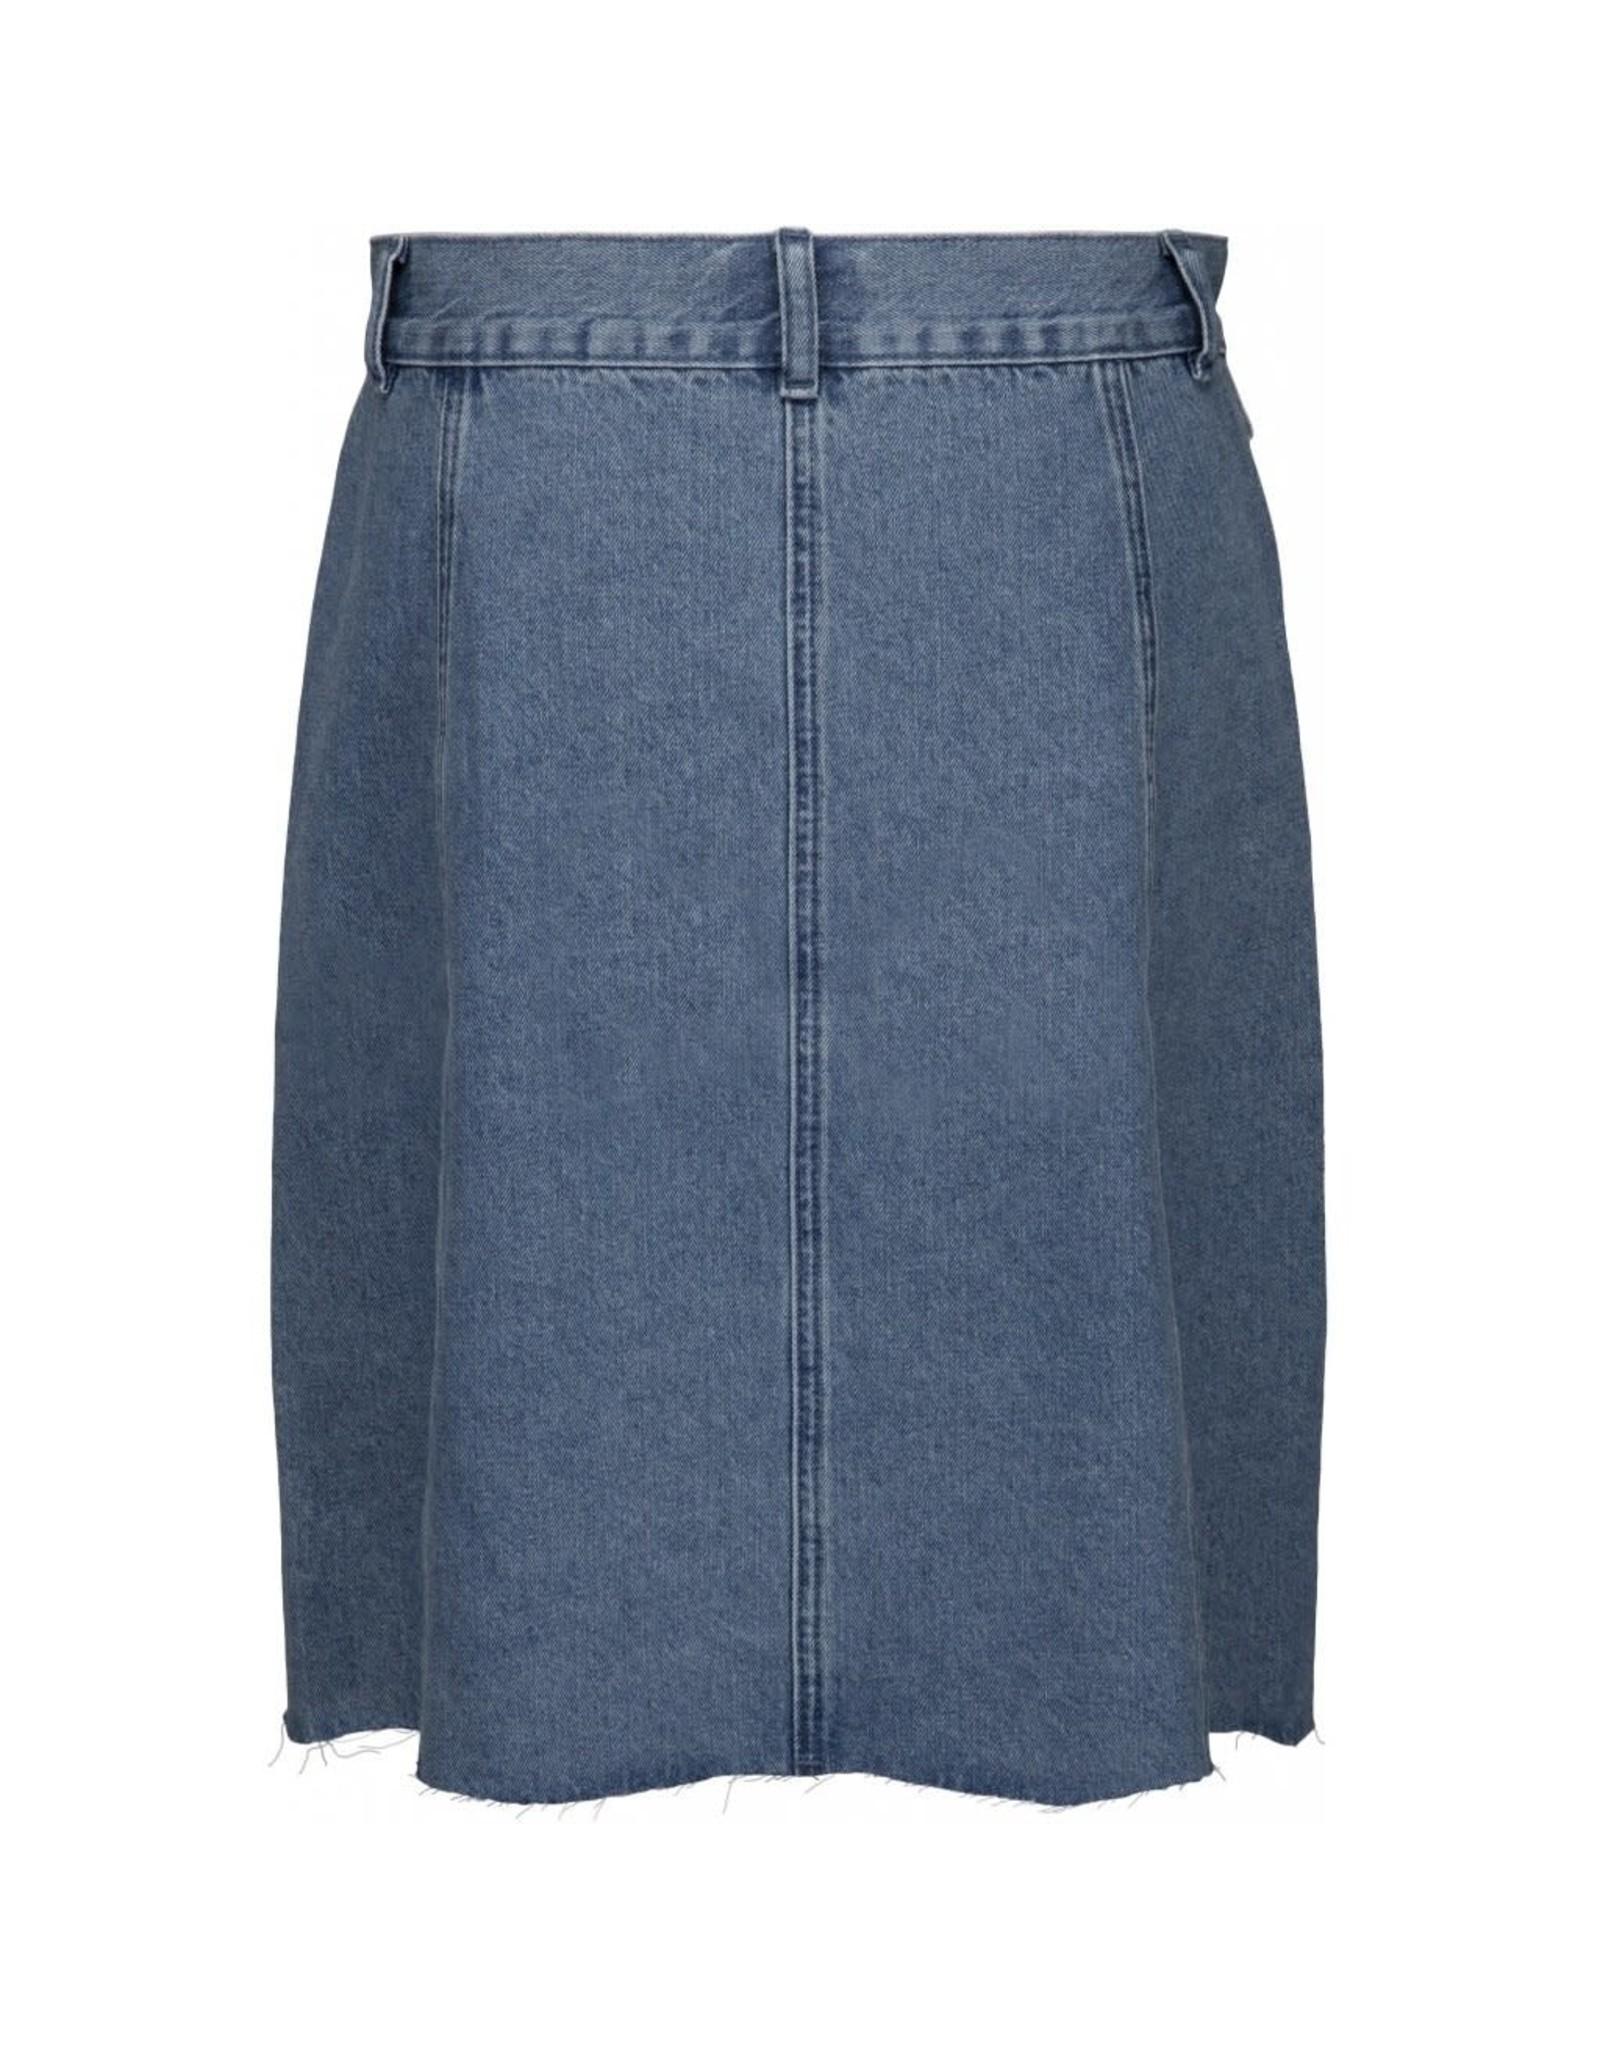 Minus Lucca Denim Skirt